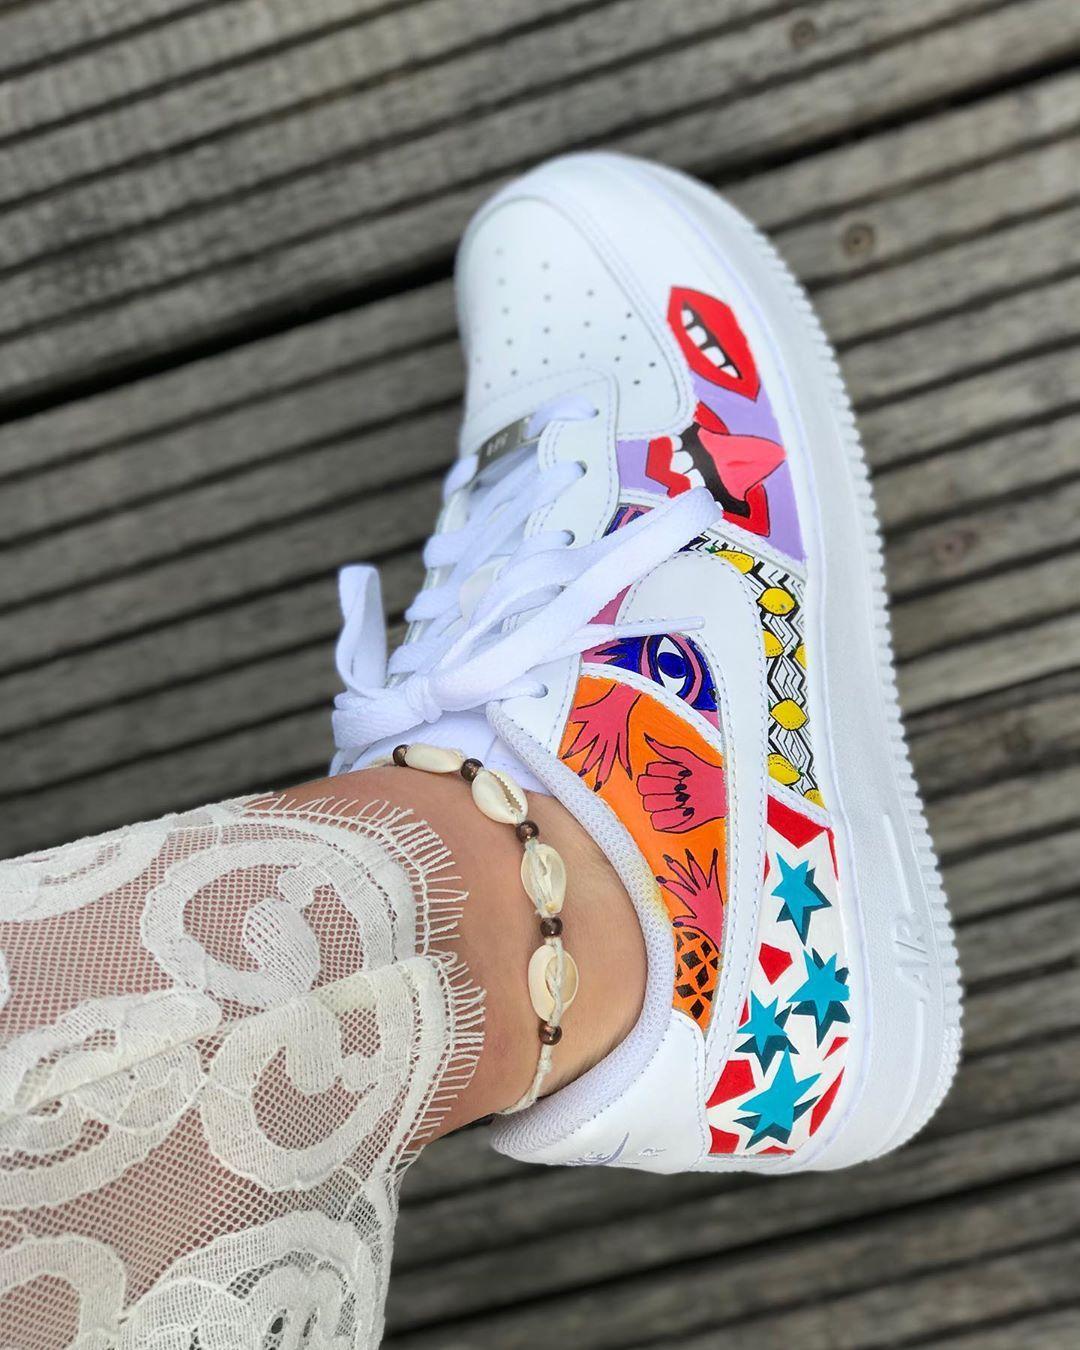 Nike schuhe damen von Aurelia Ibers auf custom chlothes in 2020